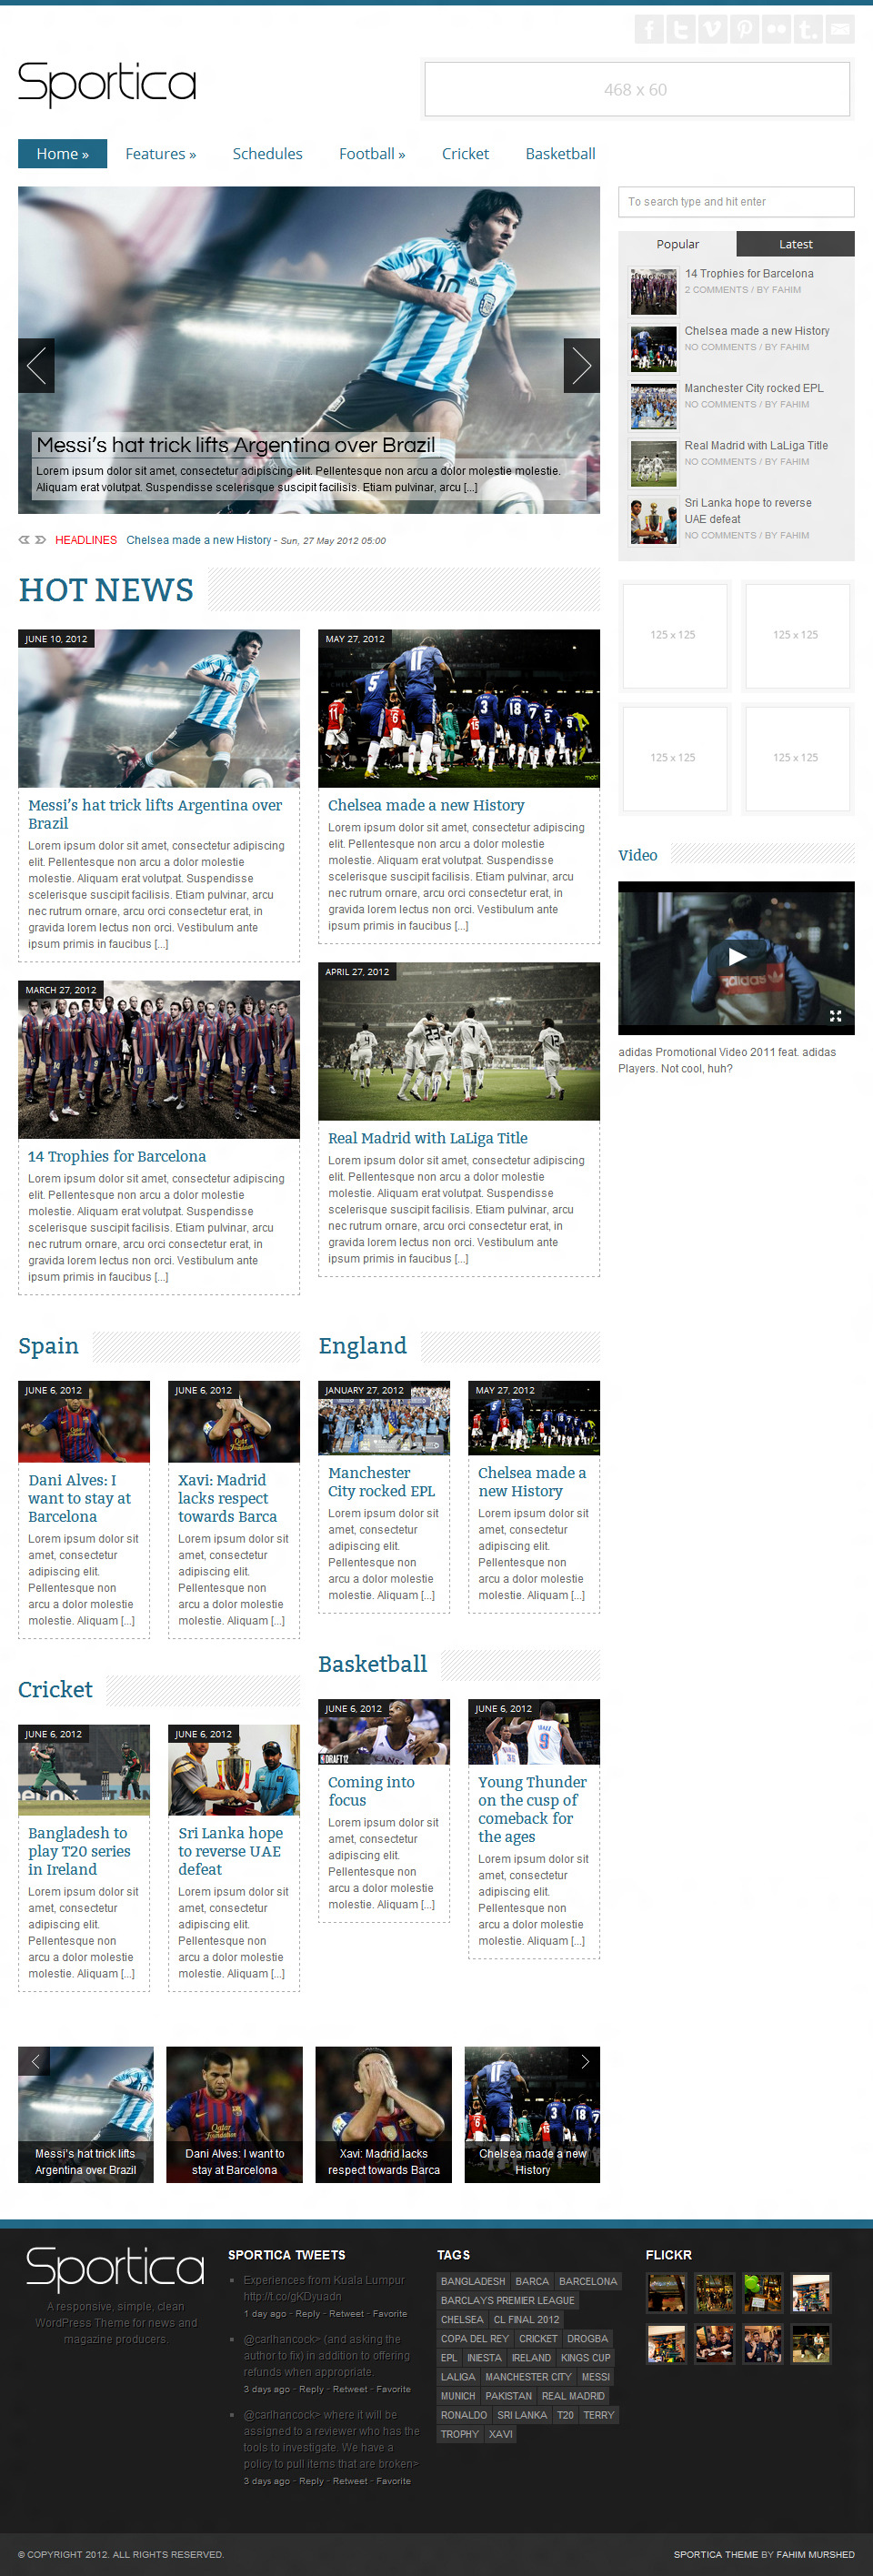 Sportica - Responsive Sports News/Magazine